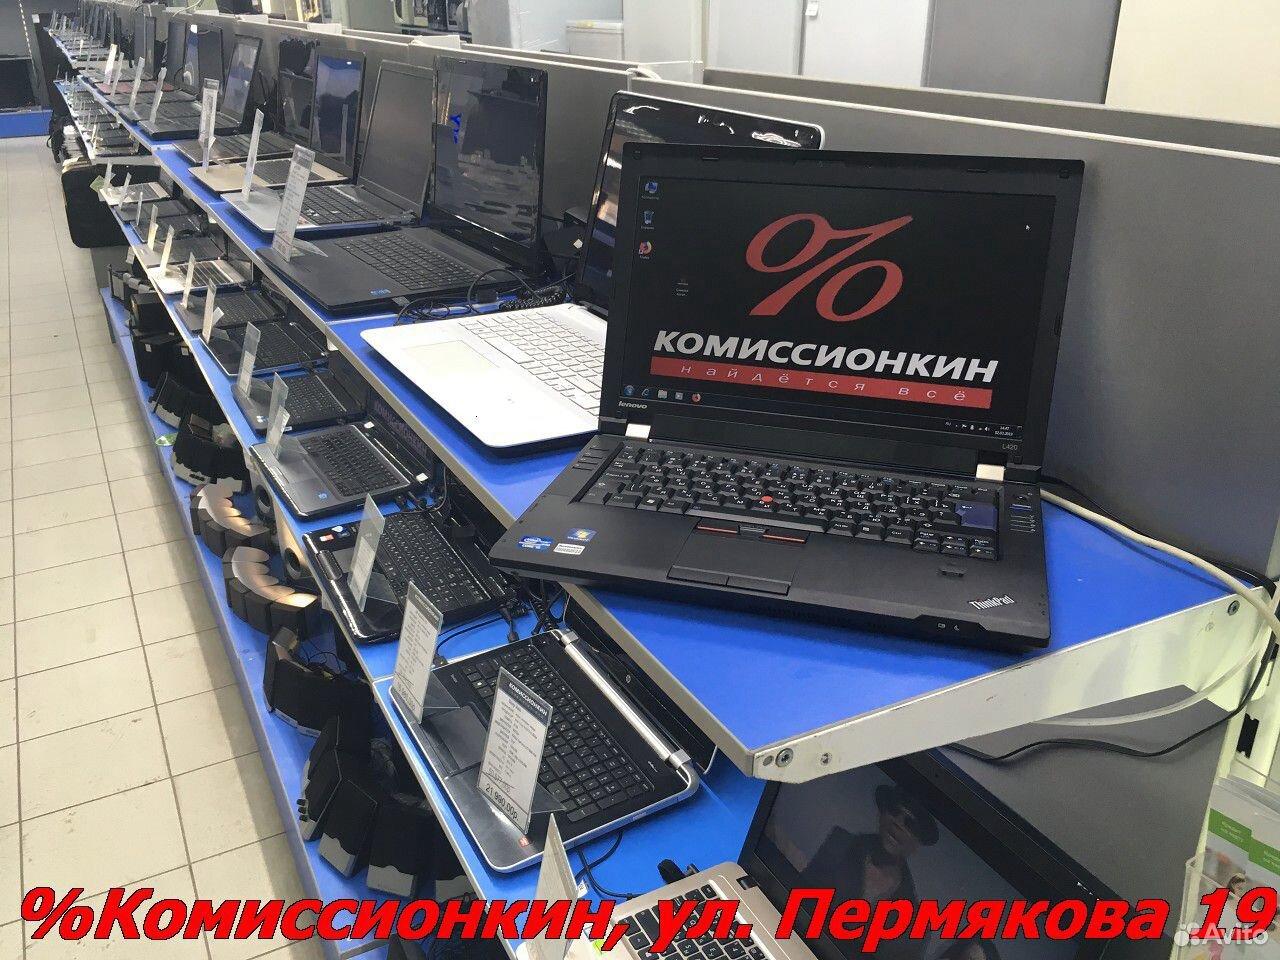 Ноутбук Lenovo i5 ThinkPad L420 Гарантия 4 мес.Рас  83452578368 купить 1